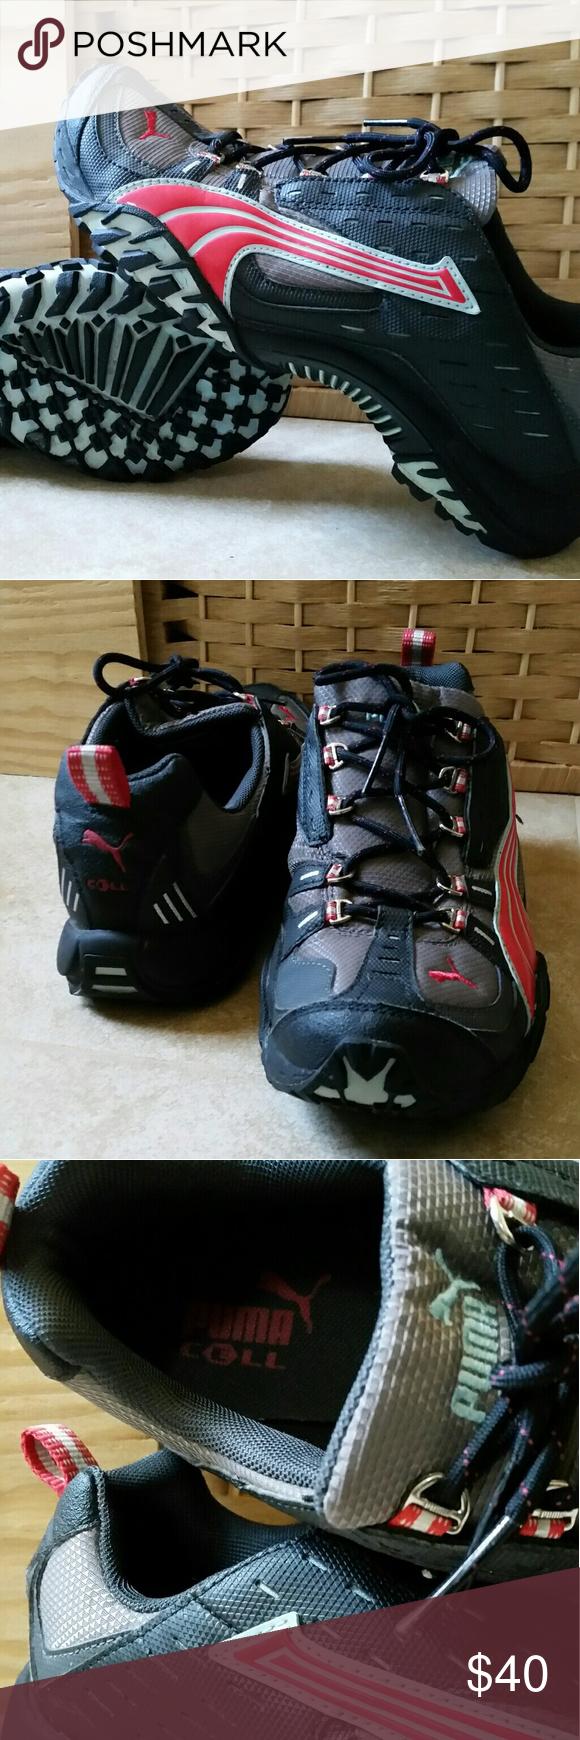 854076805c57 Puma Cell Alpine Racer Shoes